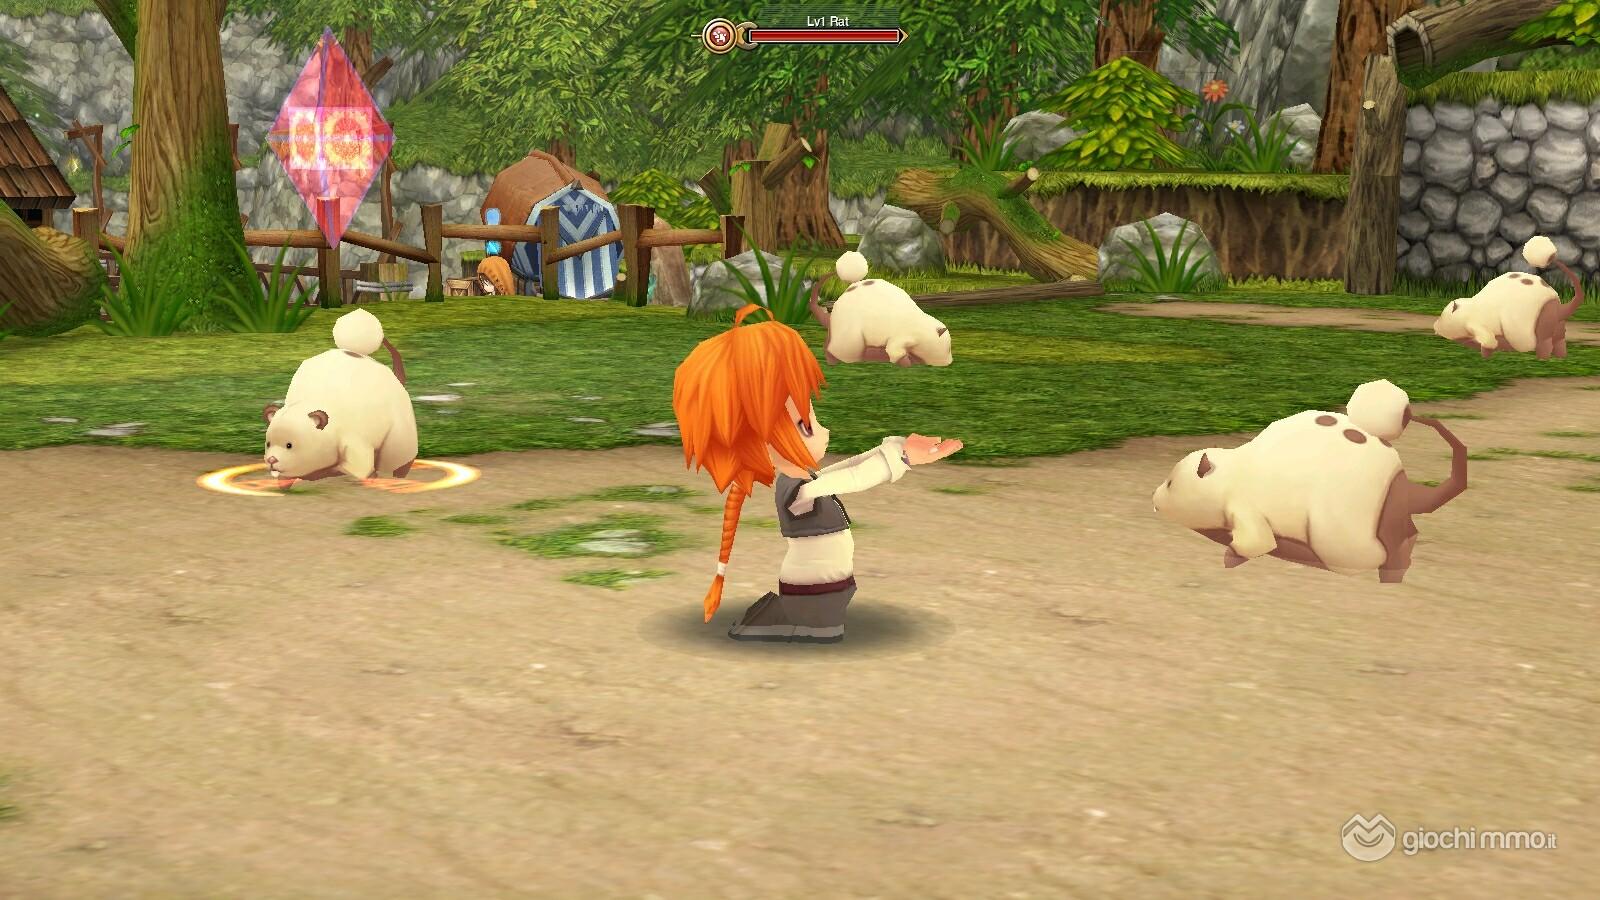 Clicca sull'immagine per ingrandirlaNome: Legend of edda screen02.jpgVisite: 59Dimensione: 379.6 KBID: 8520